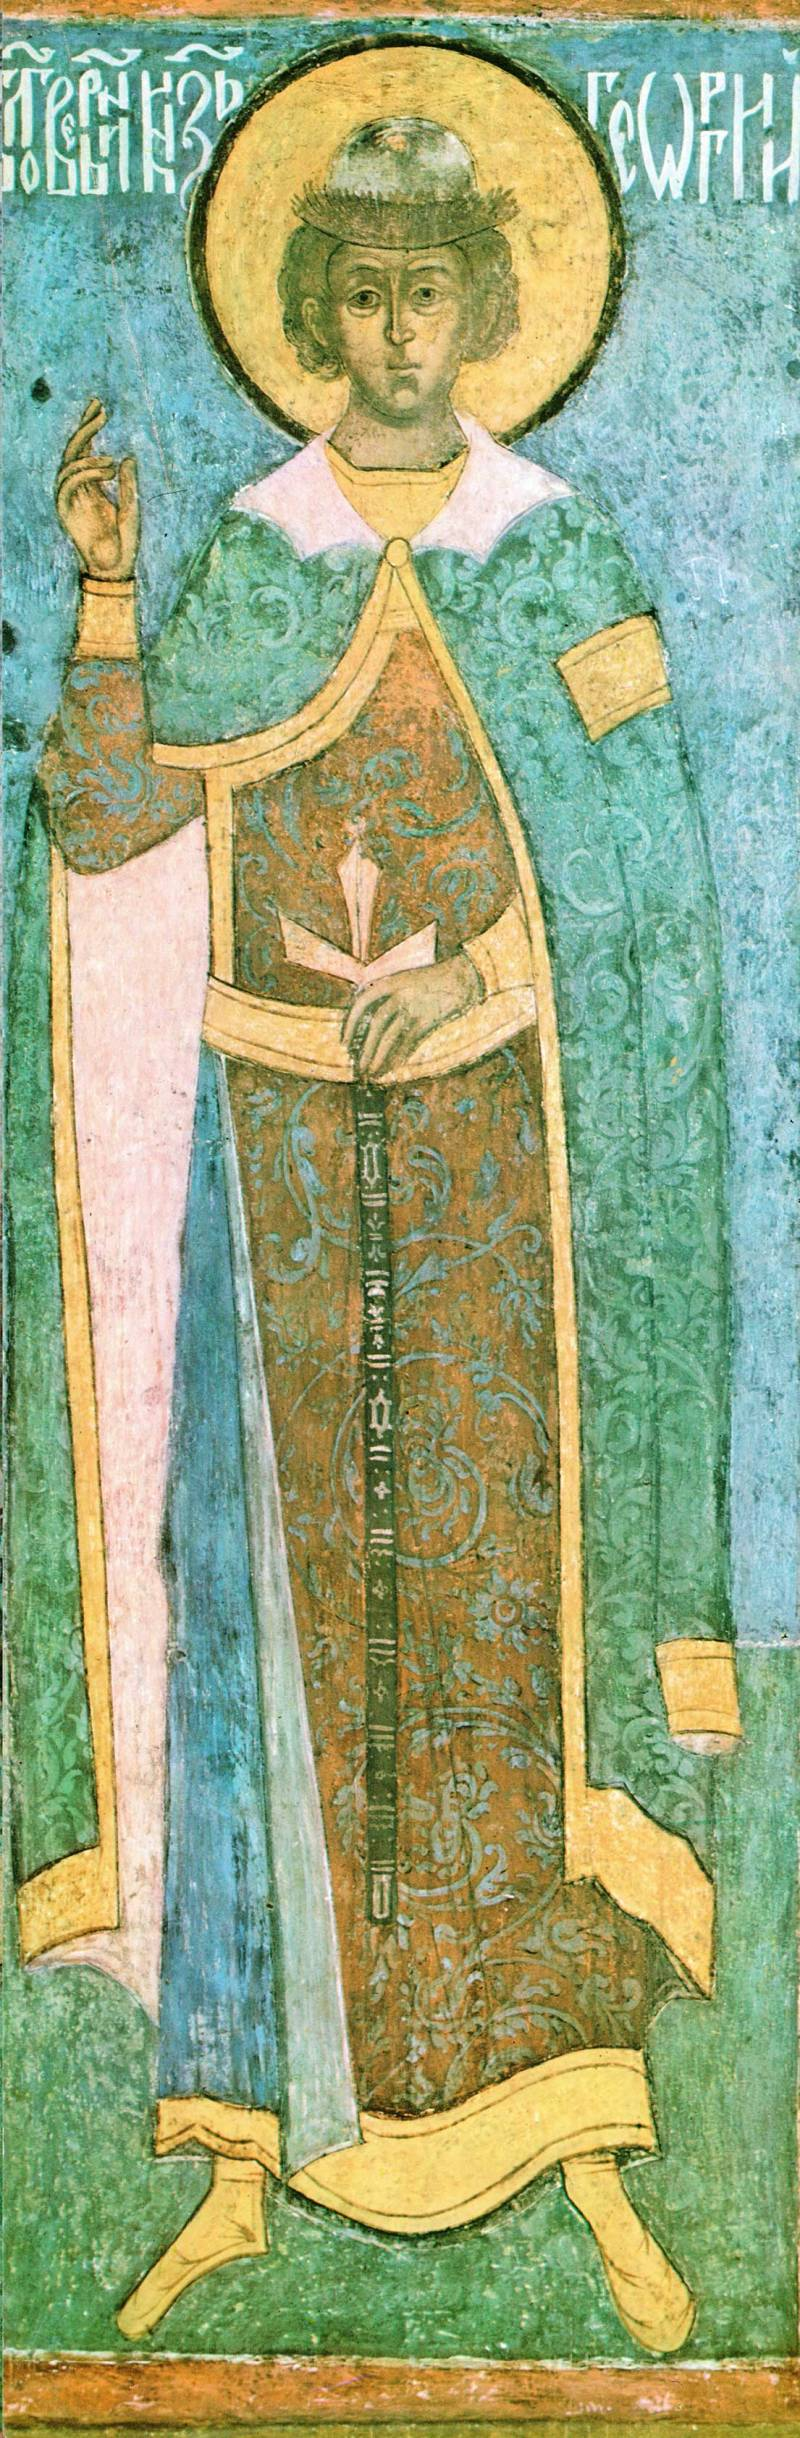 Святой князь Георгий